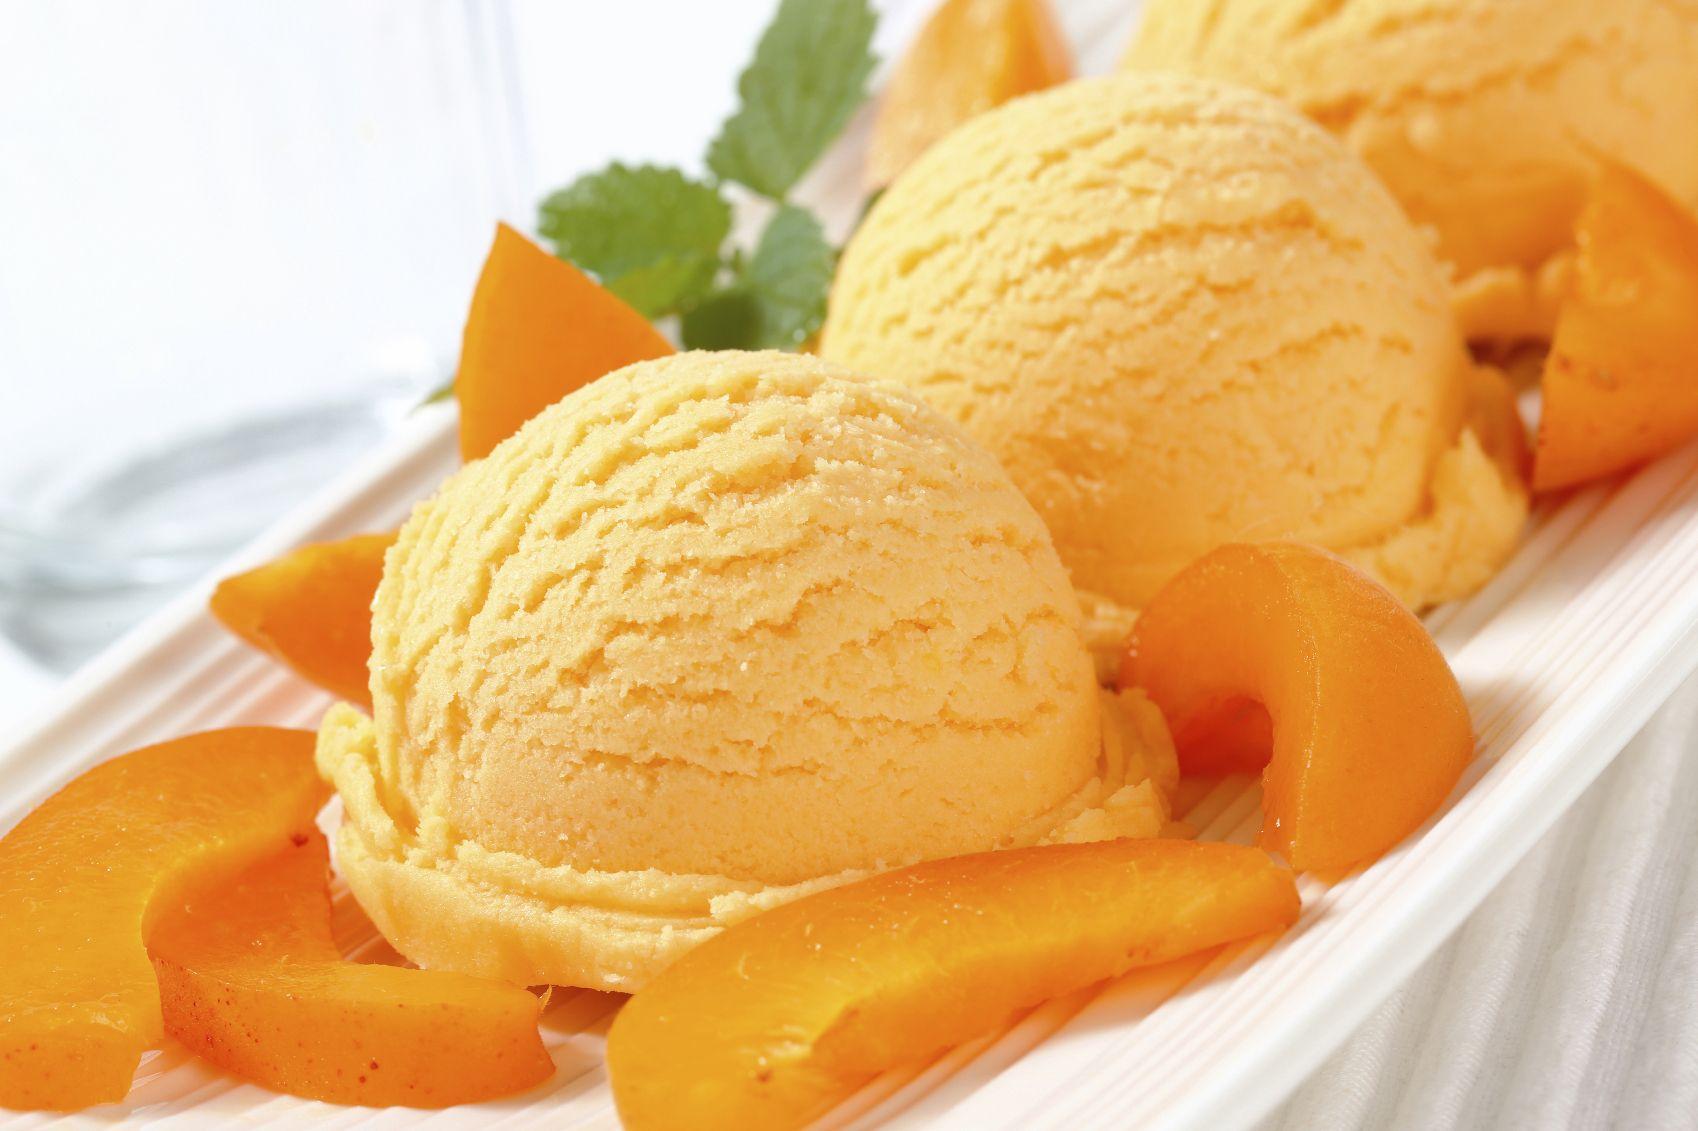 Mango Ice Cream Wallpaper : Find best latest Mango Ice ...